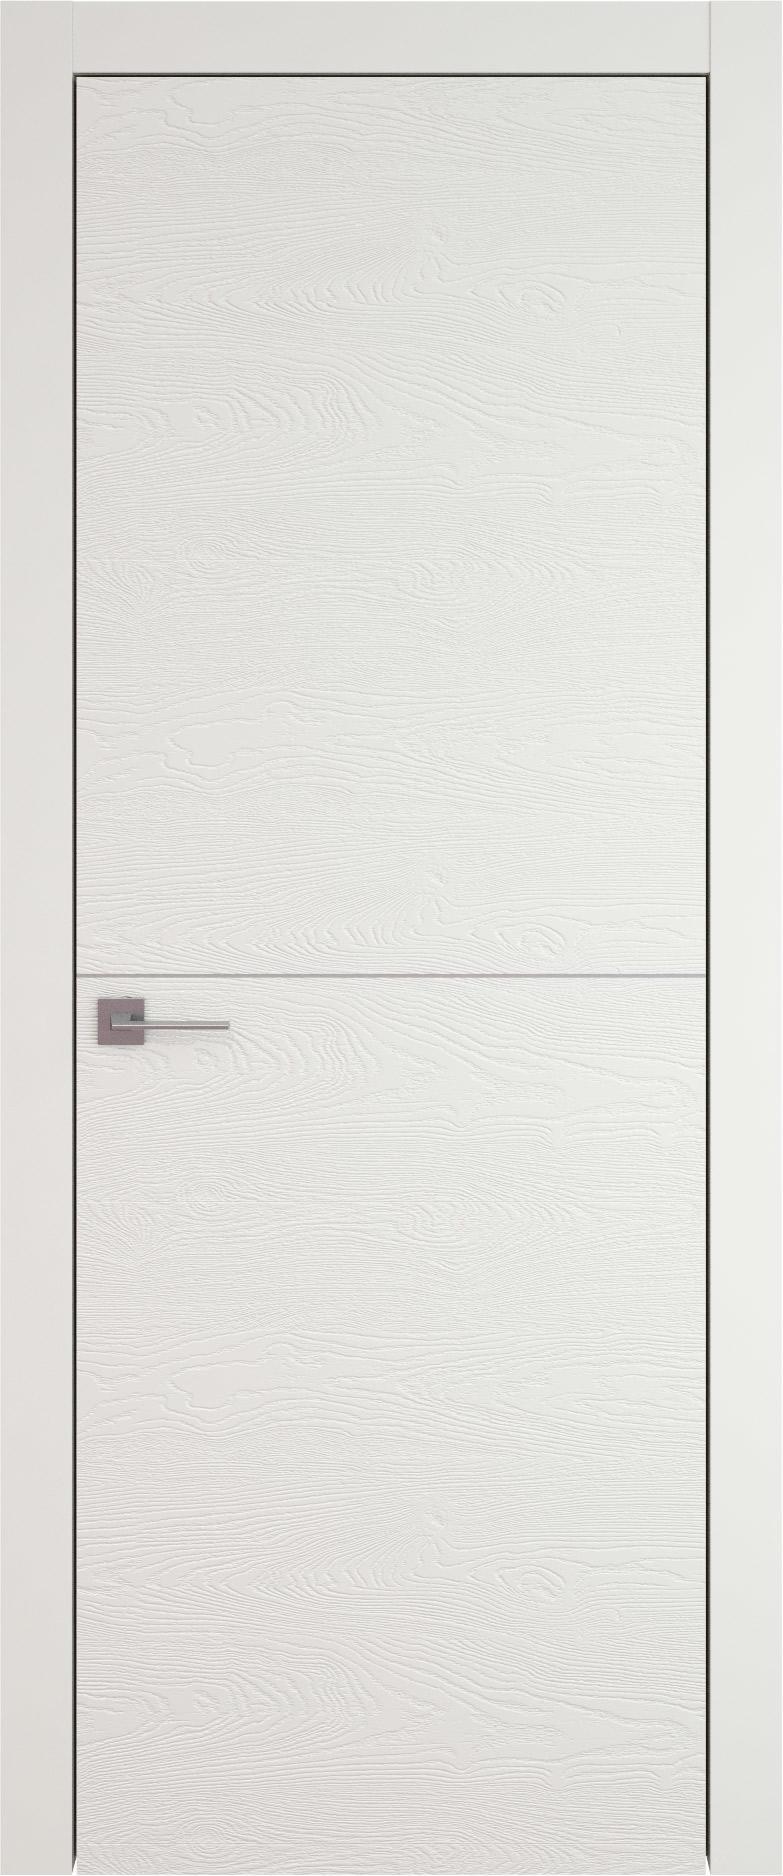 Tivoli Б-3 цвет - Бежевая эмаль по шпону (RAL 9010) Без стекла (ДГ)